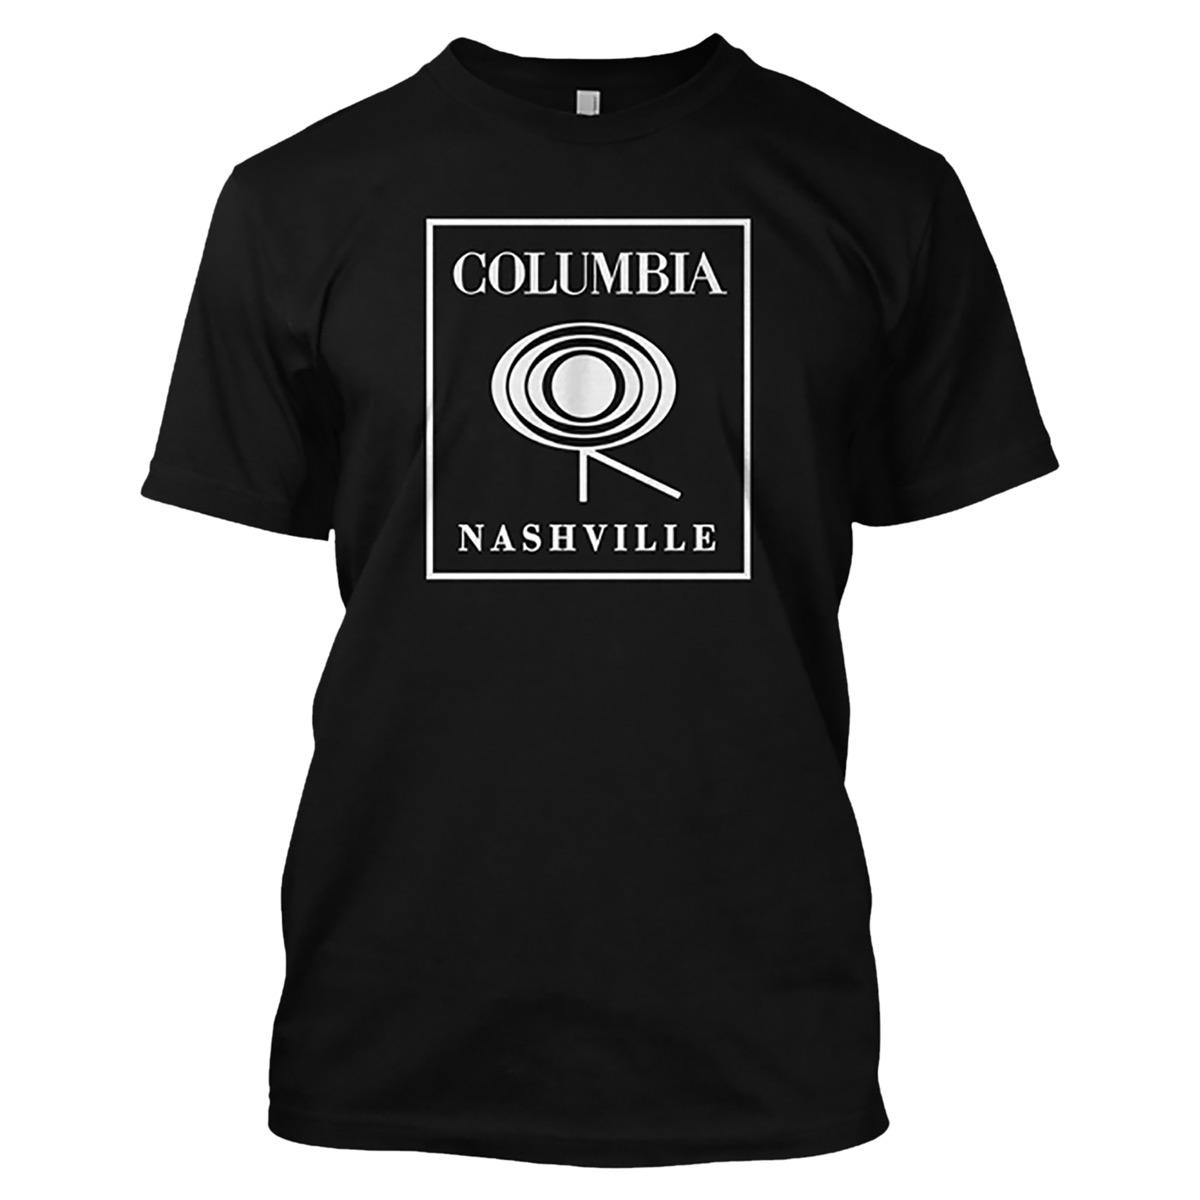 Columbia Nashville Label Logo T-shirt